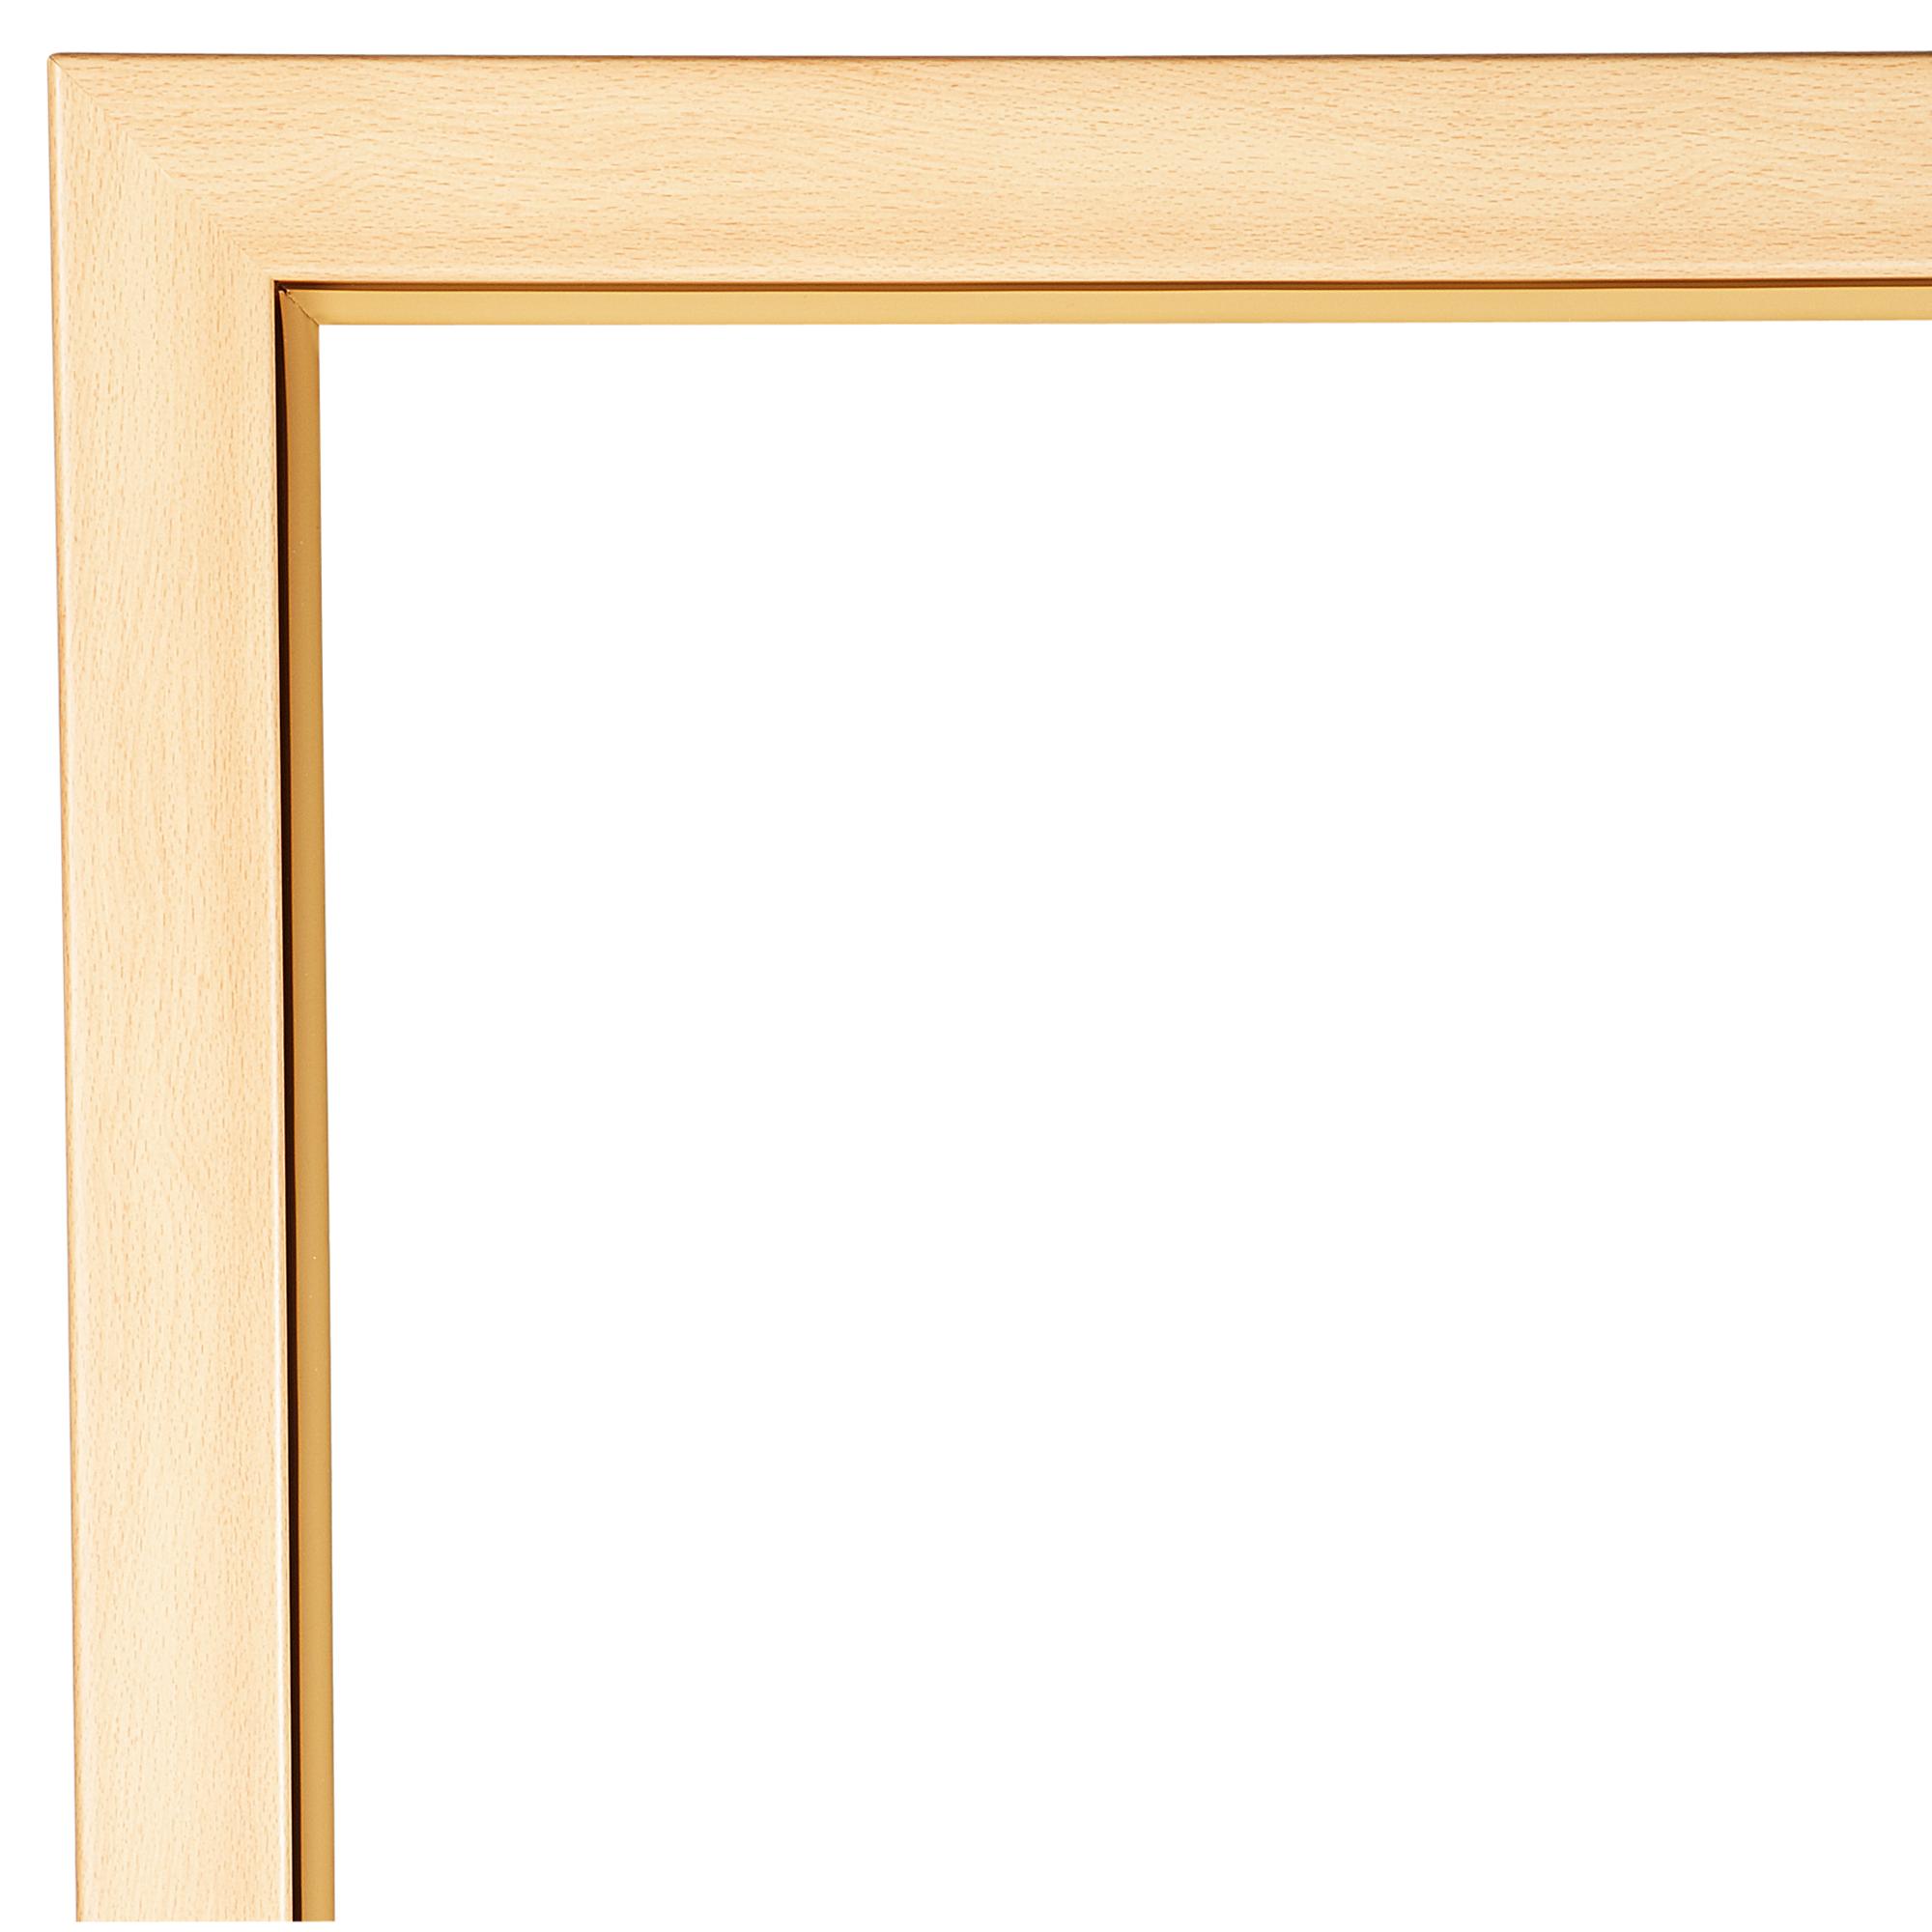 Türzarge GL880 Laminit buchefarben 86 x 10 cm rechts ǀ toom Baumarkt